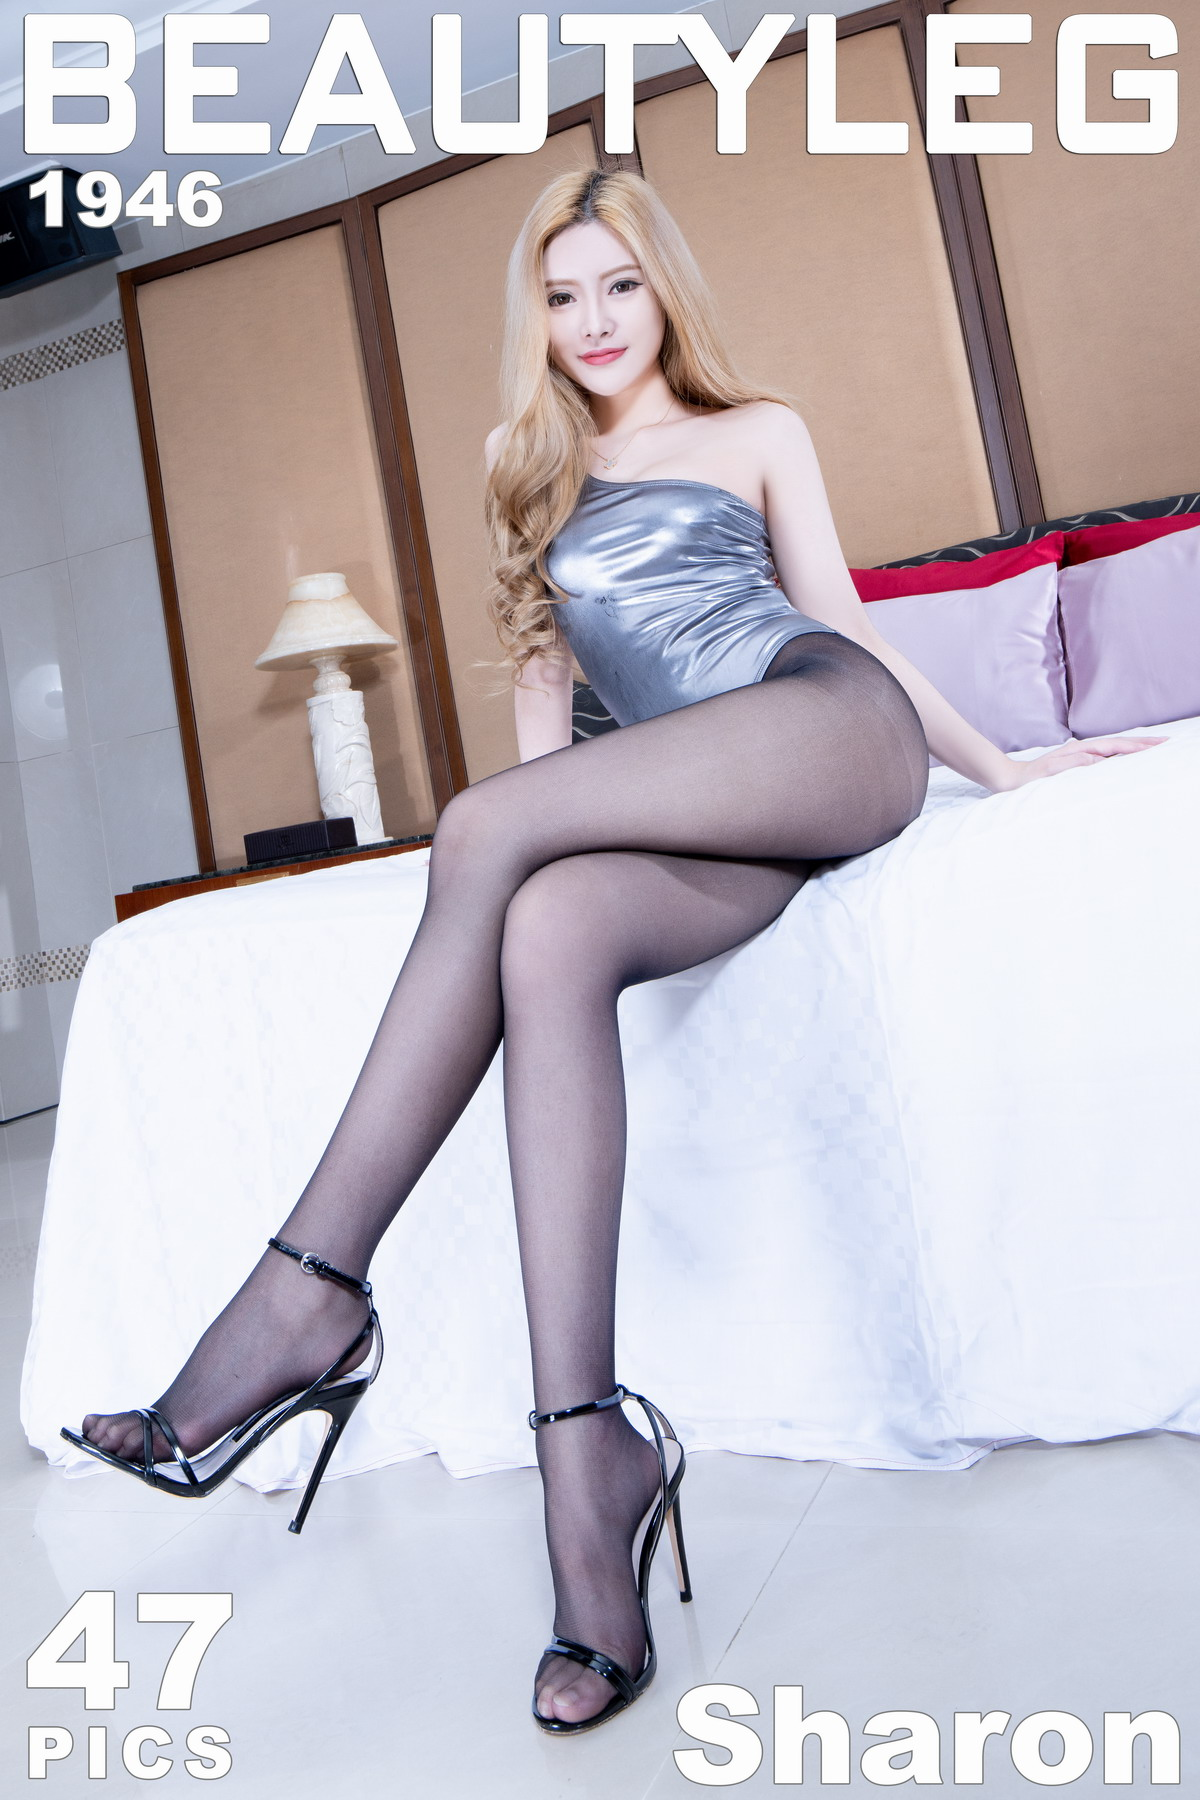 [Beautyleg]美腿写真 2020.07.13 No.1946 Sharon[/390MB]